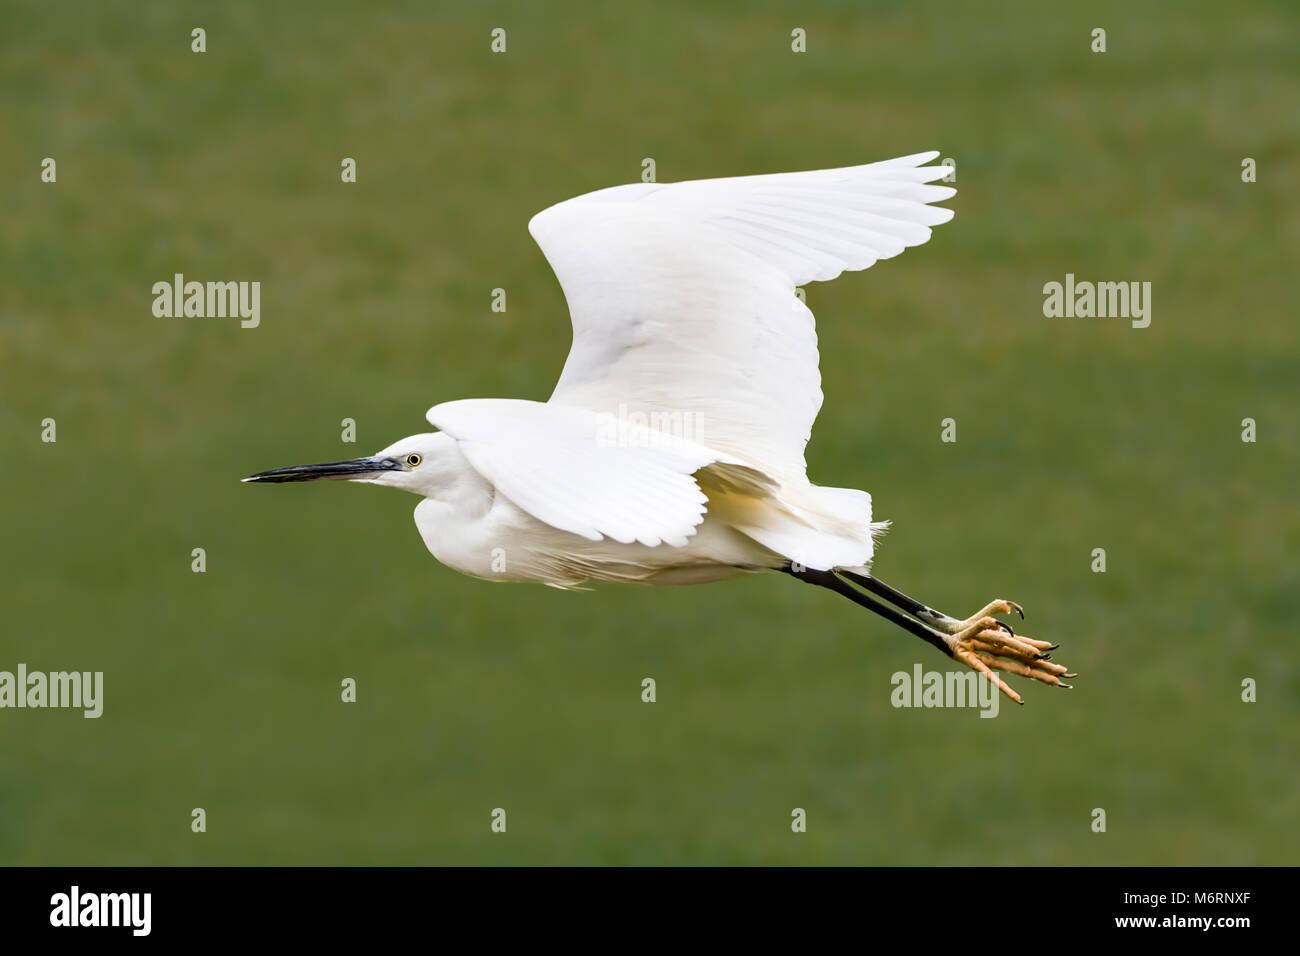 little-egret-bird-egretta-garzetta-flying-over-land-on-a-very-cold-M6RNXF.jpg